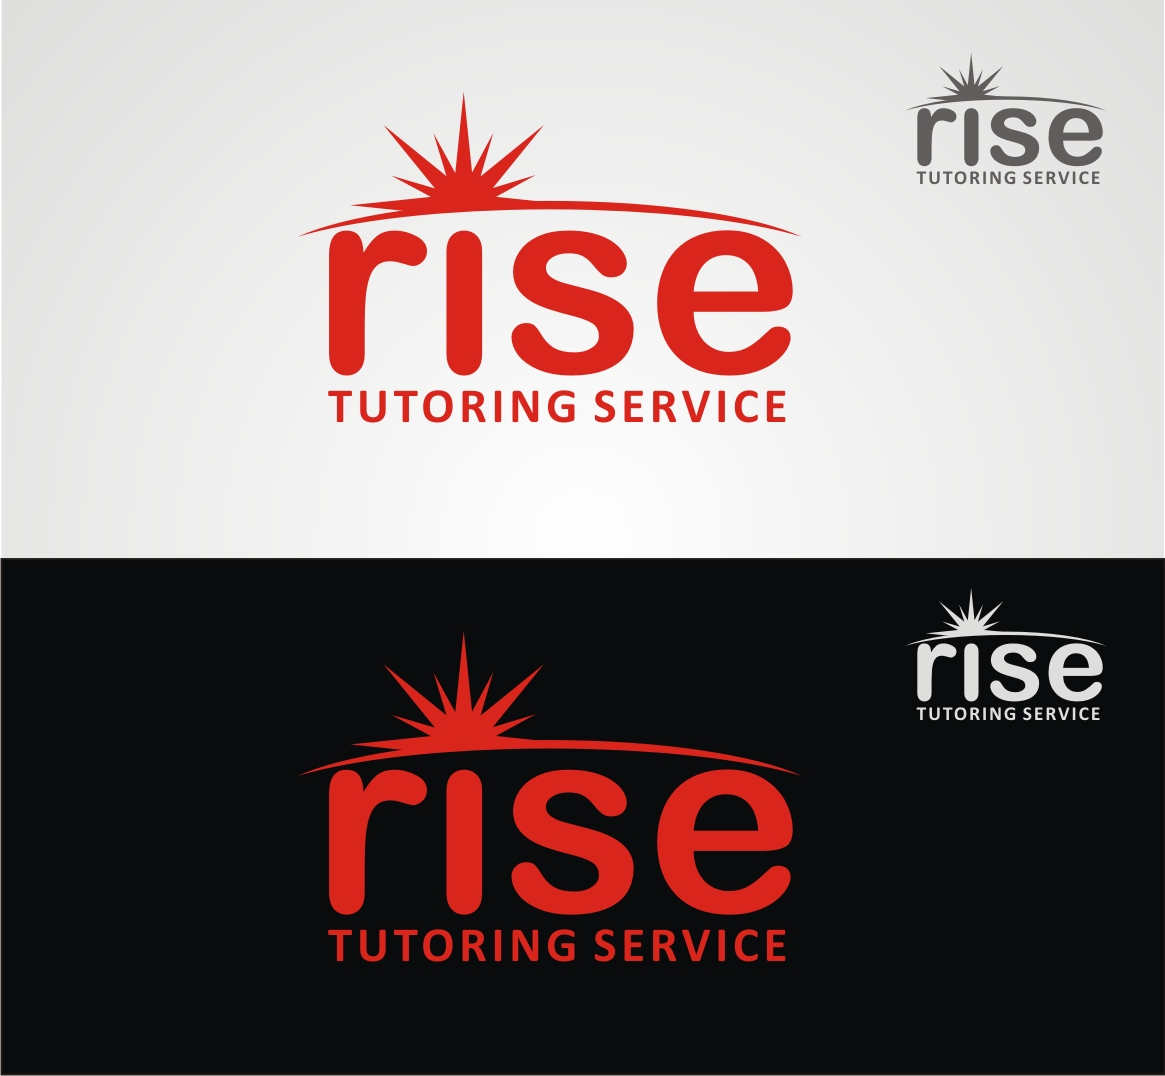 Logo Design by Reivan Ferdinan - Entry No. 106 in the Logo Design Contest Imaginative Logo Design for Rise Tutoring Service.